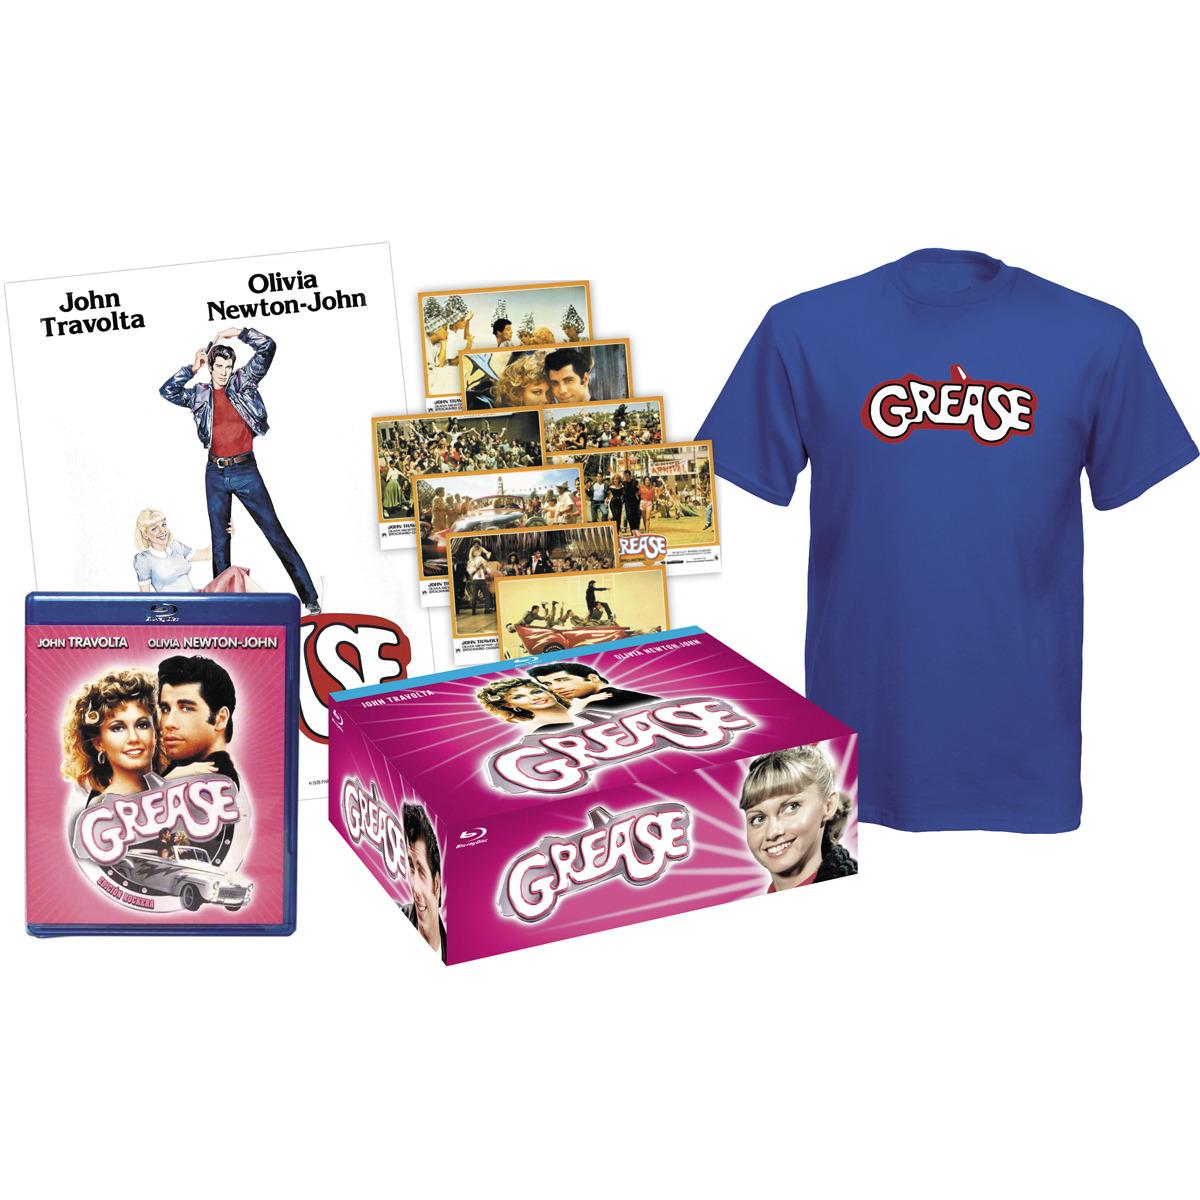 Edición Exclusiva Grease: Película Blu-Ray + Camiseta Talla L + Póster + 8 postales por 1€